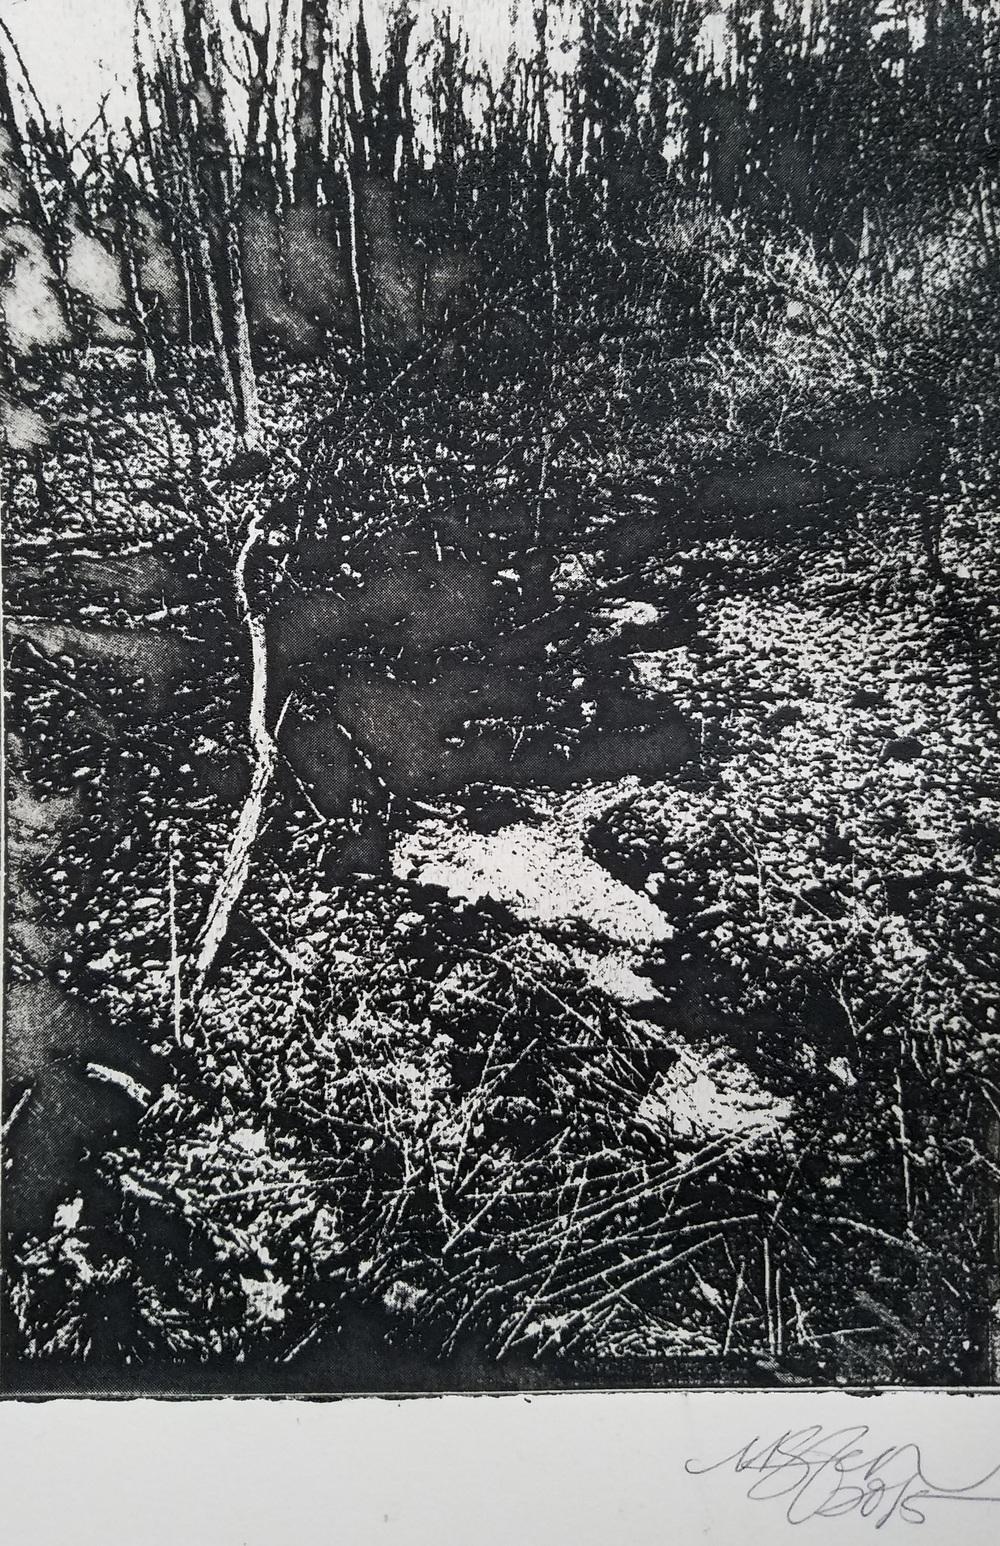 """Landscape Photograph"" -2015 Solar Plate print on Stonehenge"